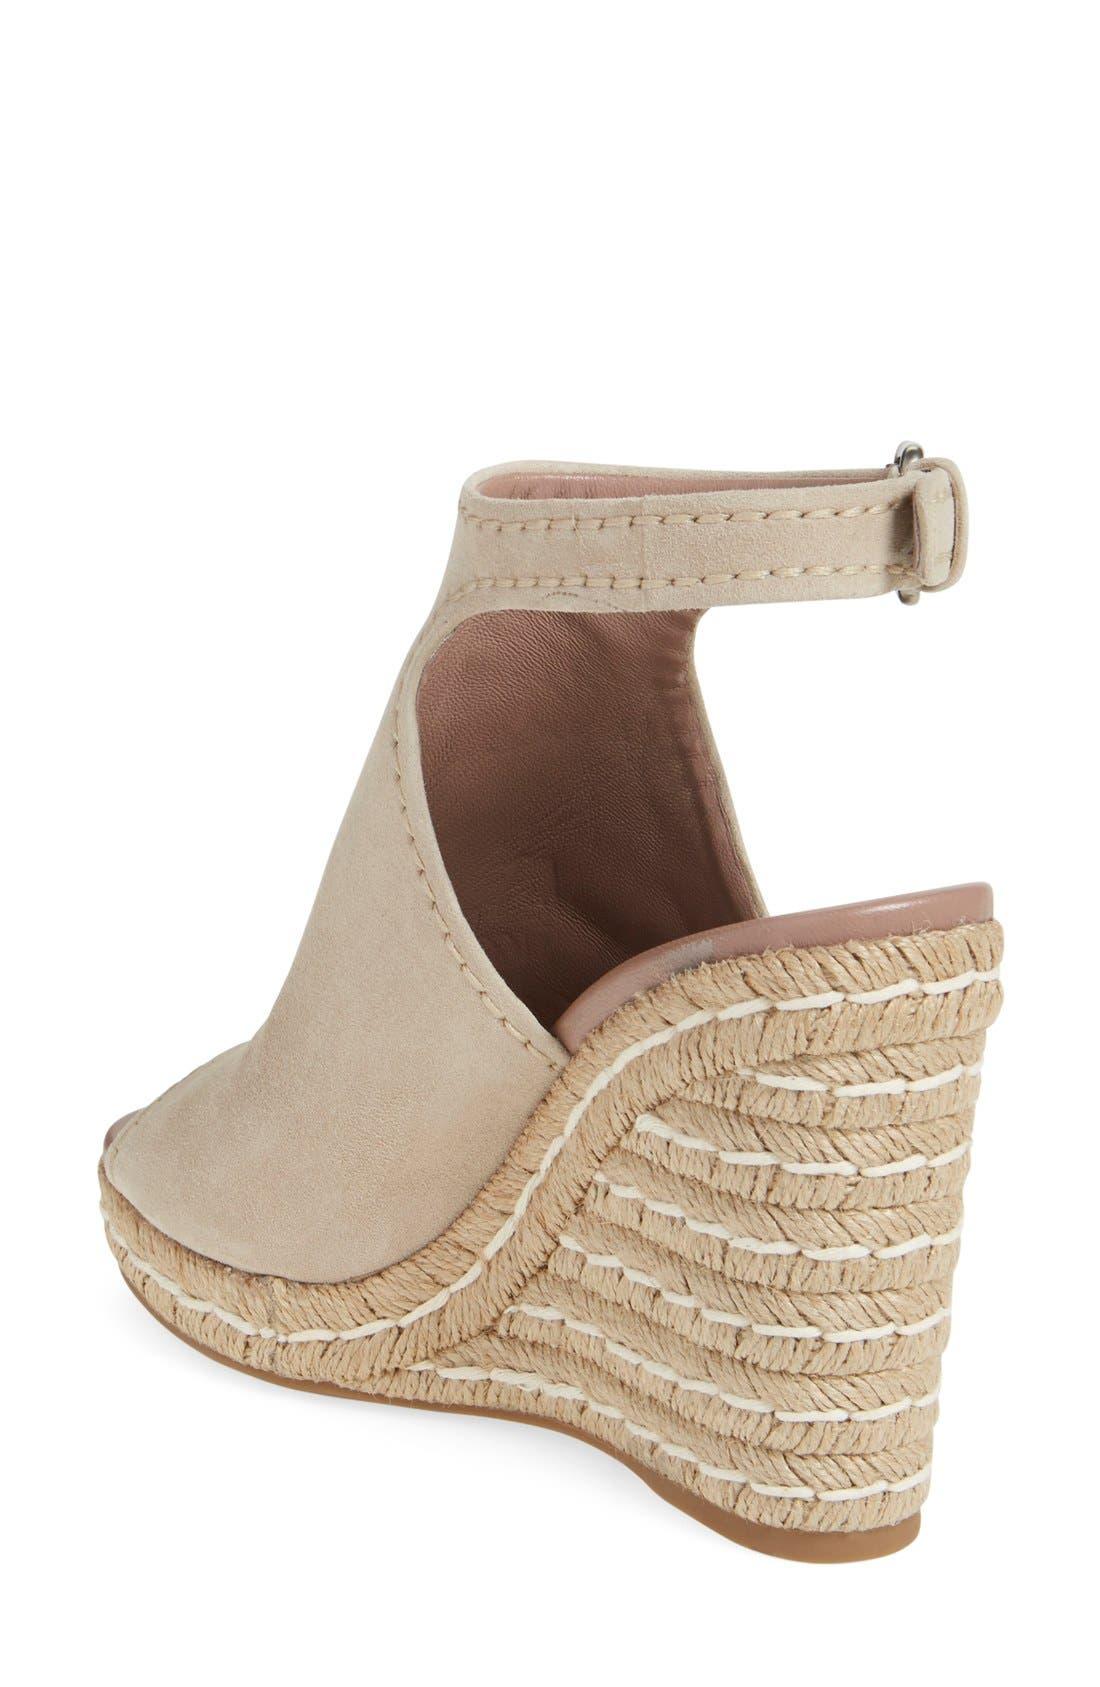 Ankle Strap Espadrille Wedge Sandal,                             Alternate thumbnail 6, color,                             250